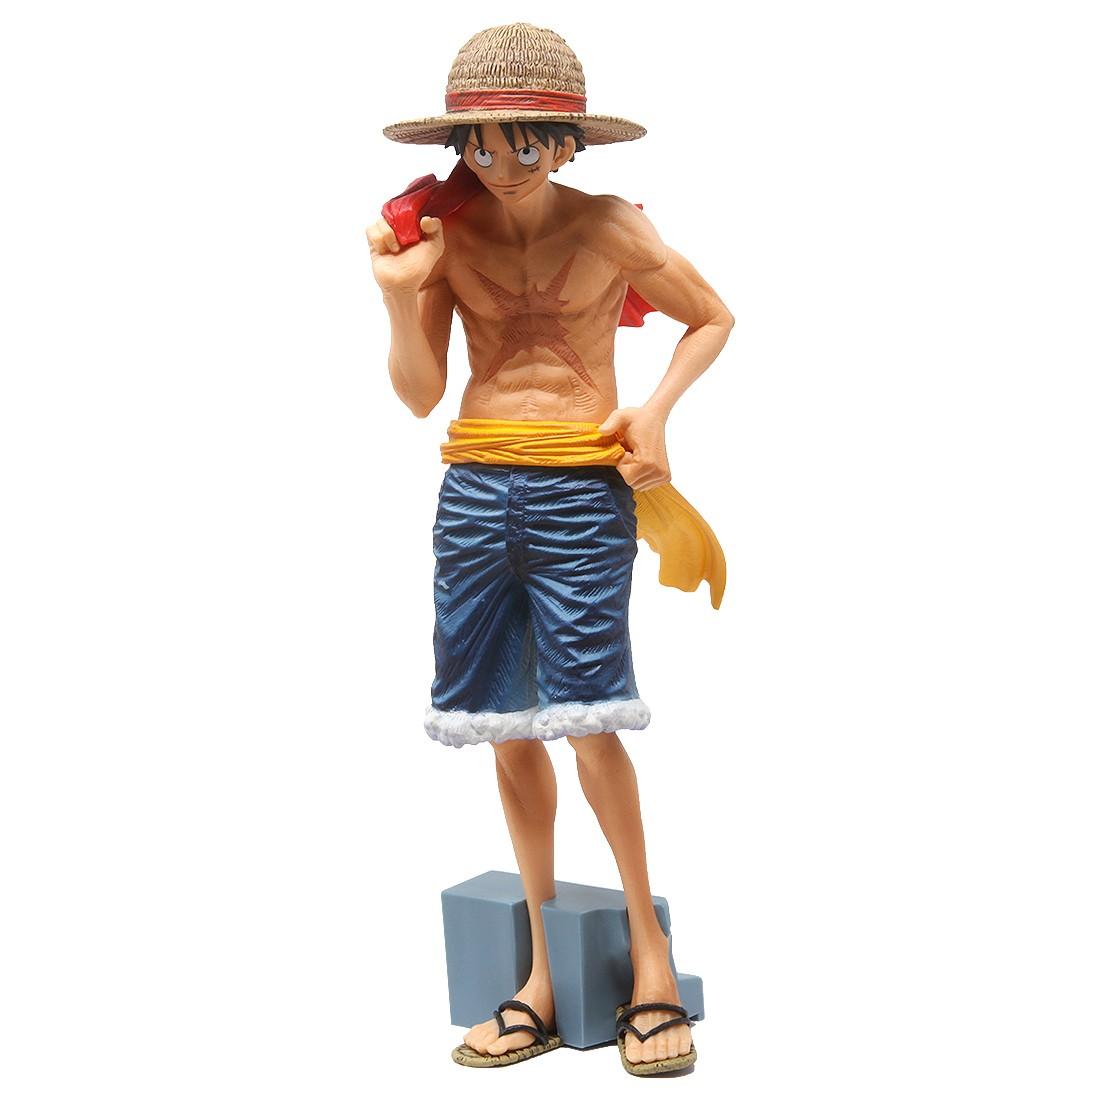 One Piece: Magazine Figure Vol 2 Luffy Figure by Banpresto Monkey D